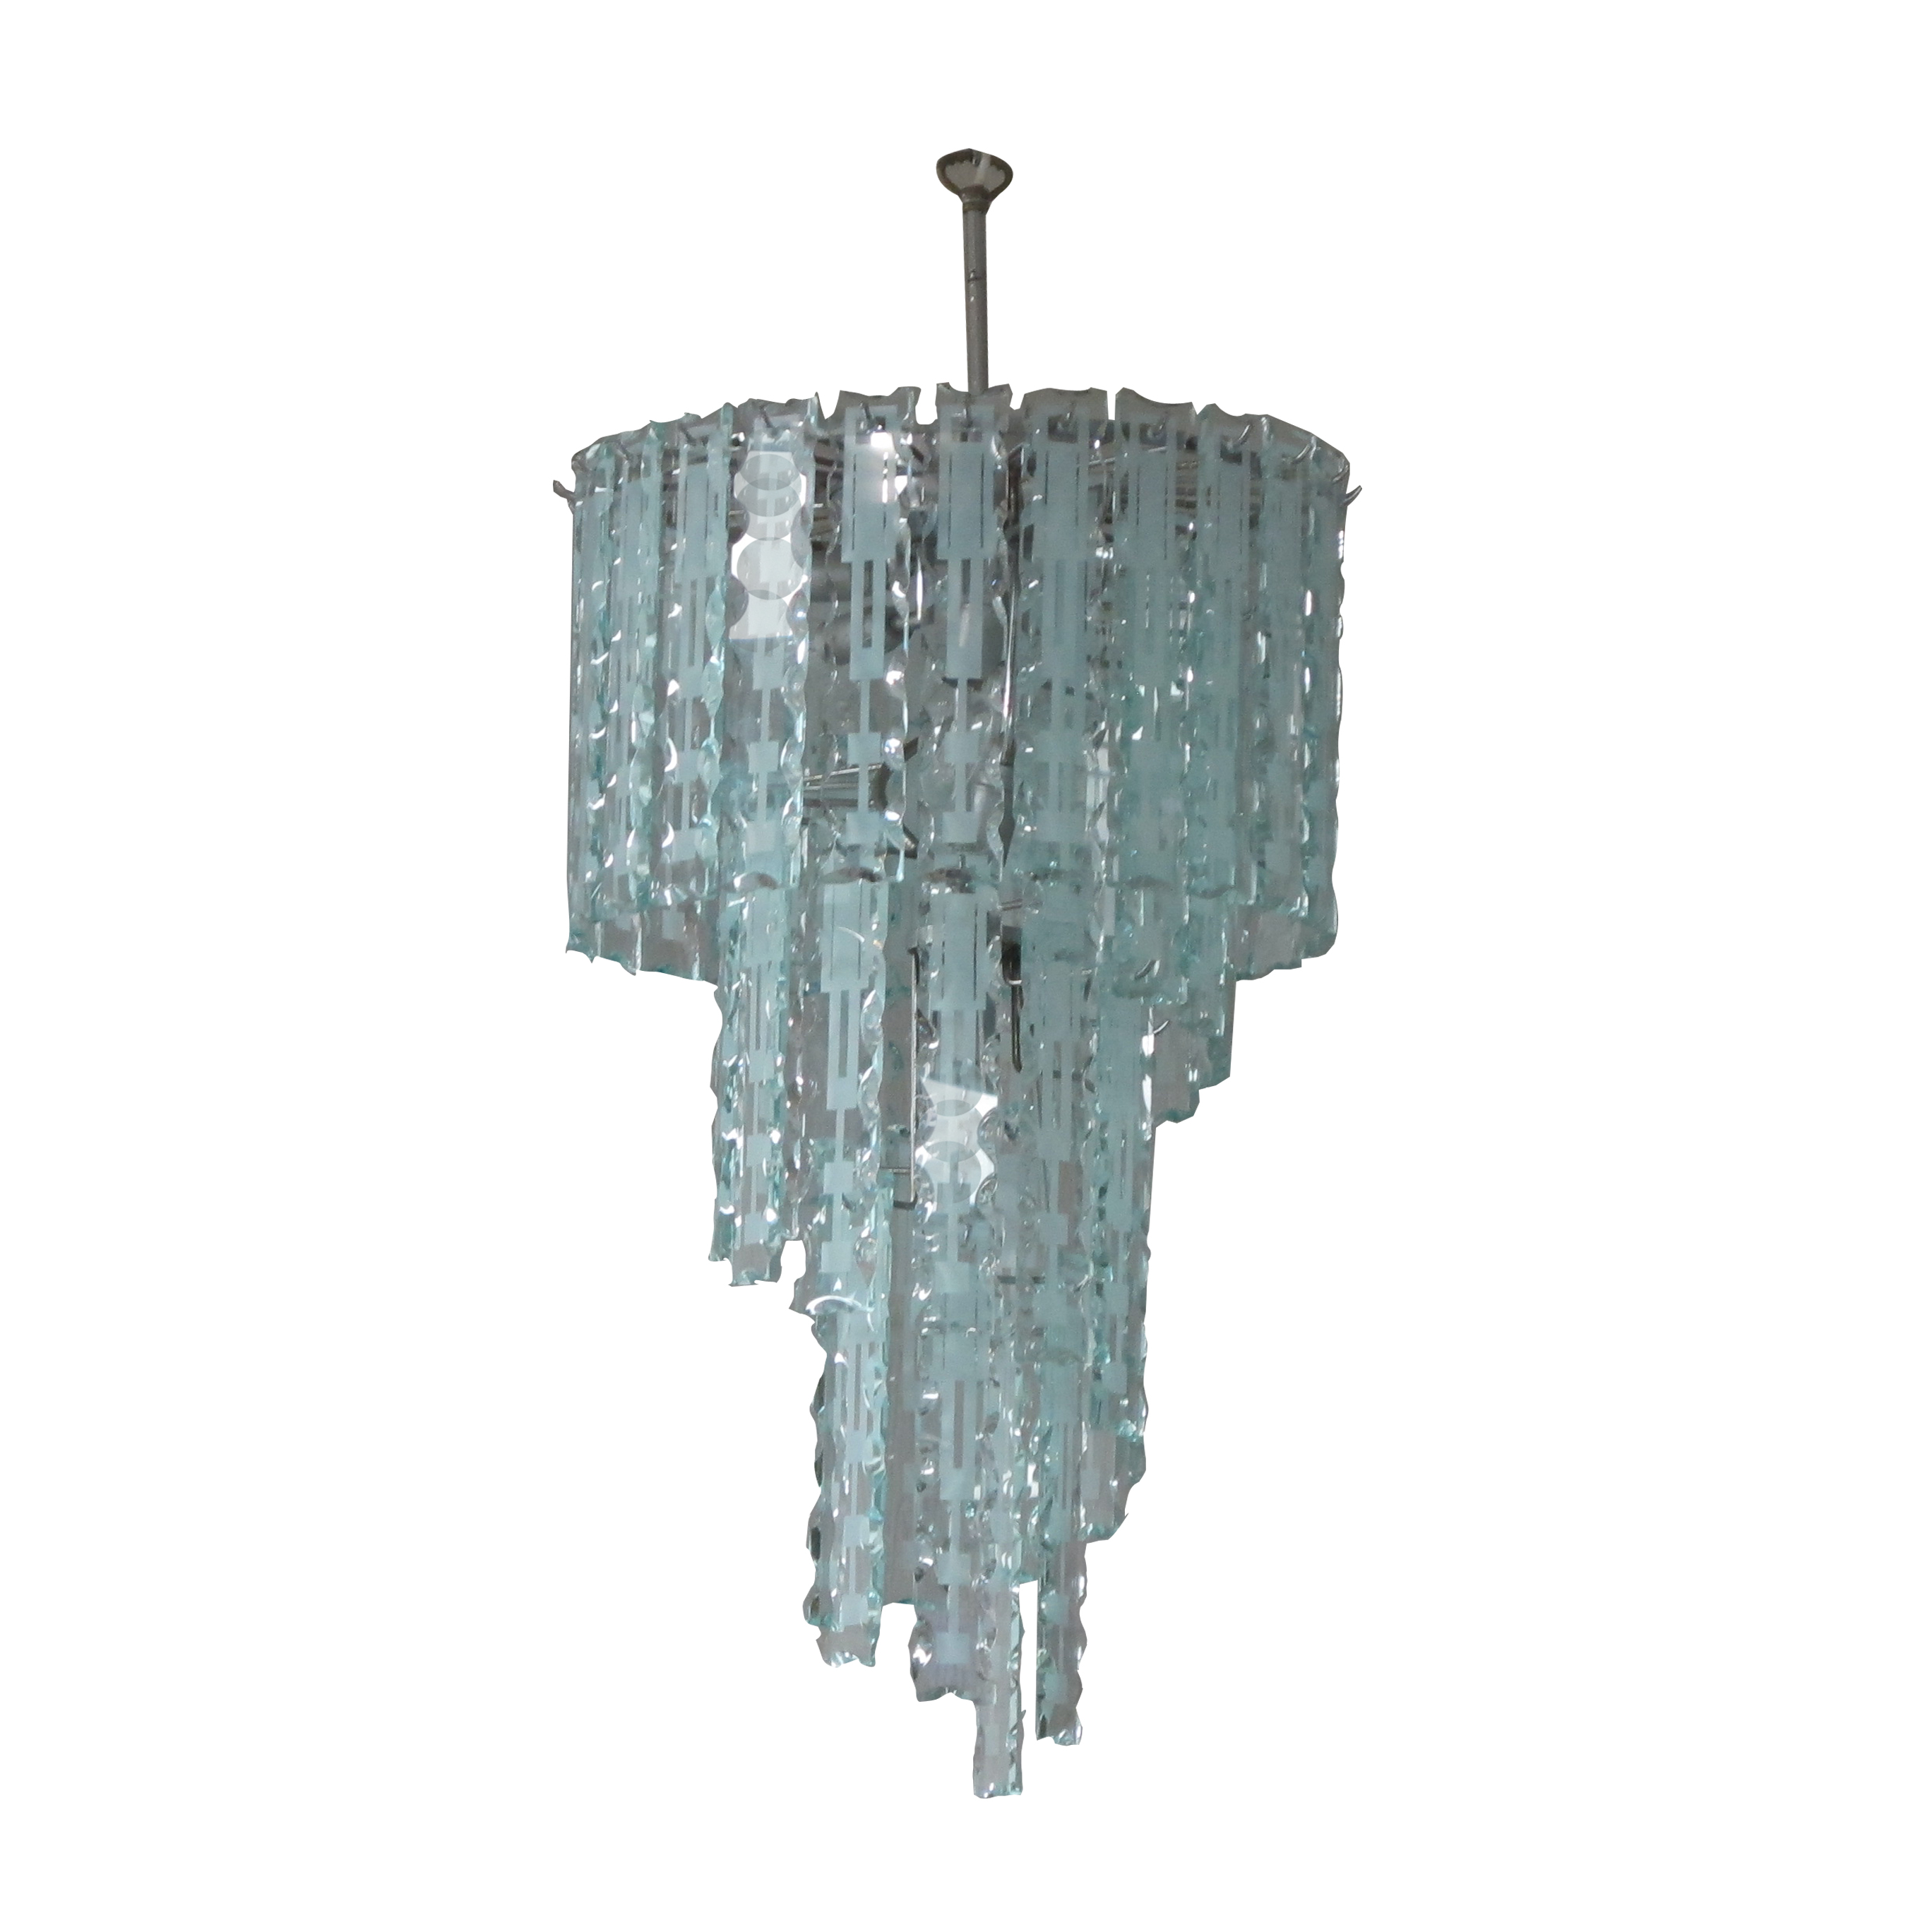 fontana arte chandelier interior boutiques antiques. Black Bedroom Furniture Sets. Home Design Ideas